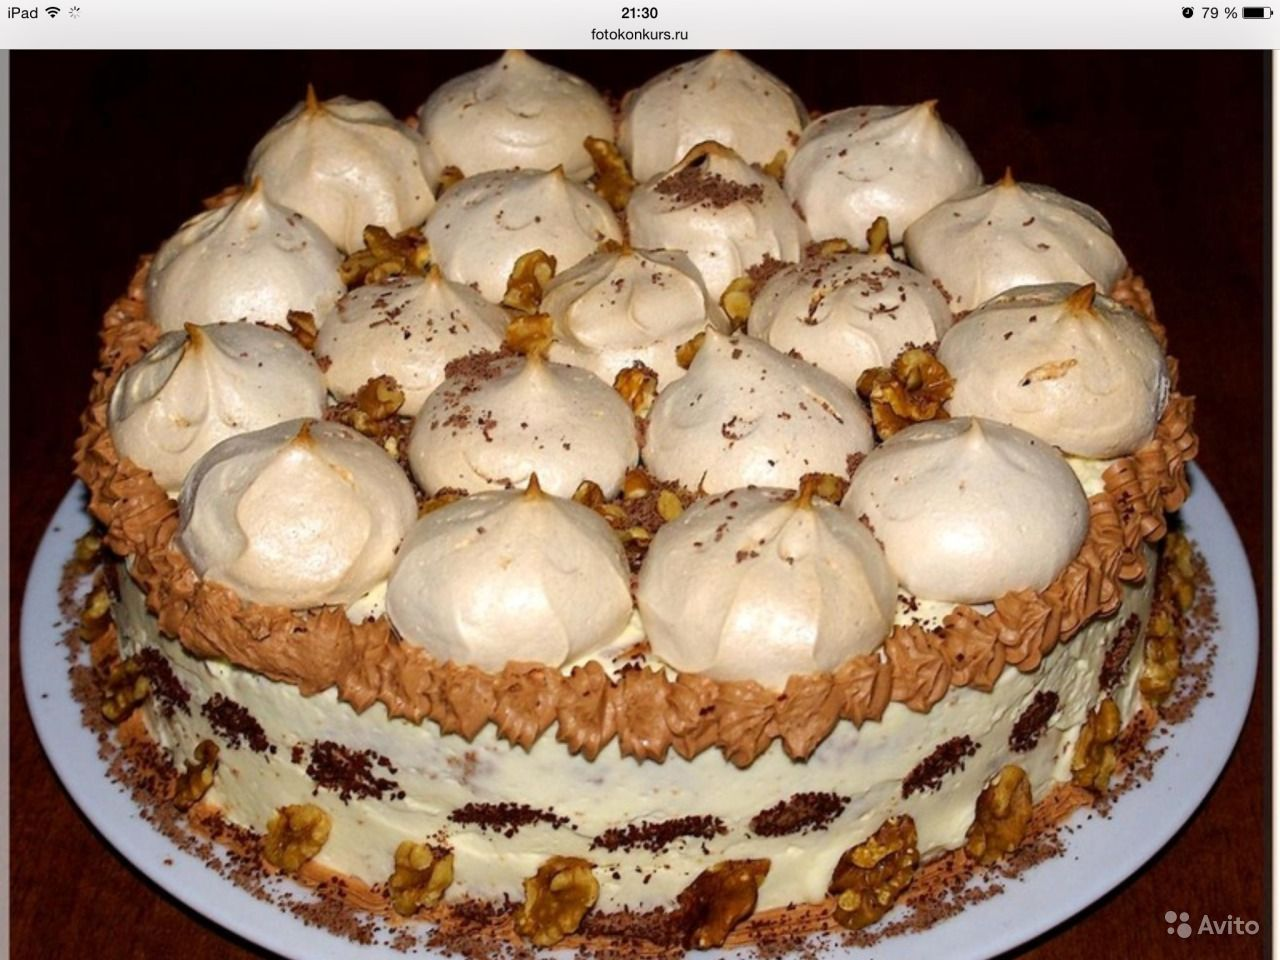 Торт из безе рецепт пошагово в домашних